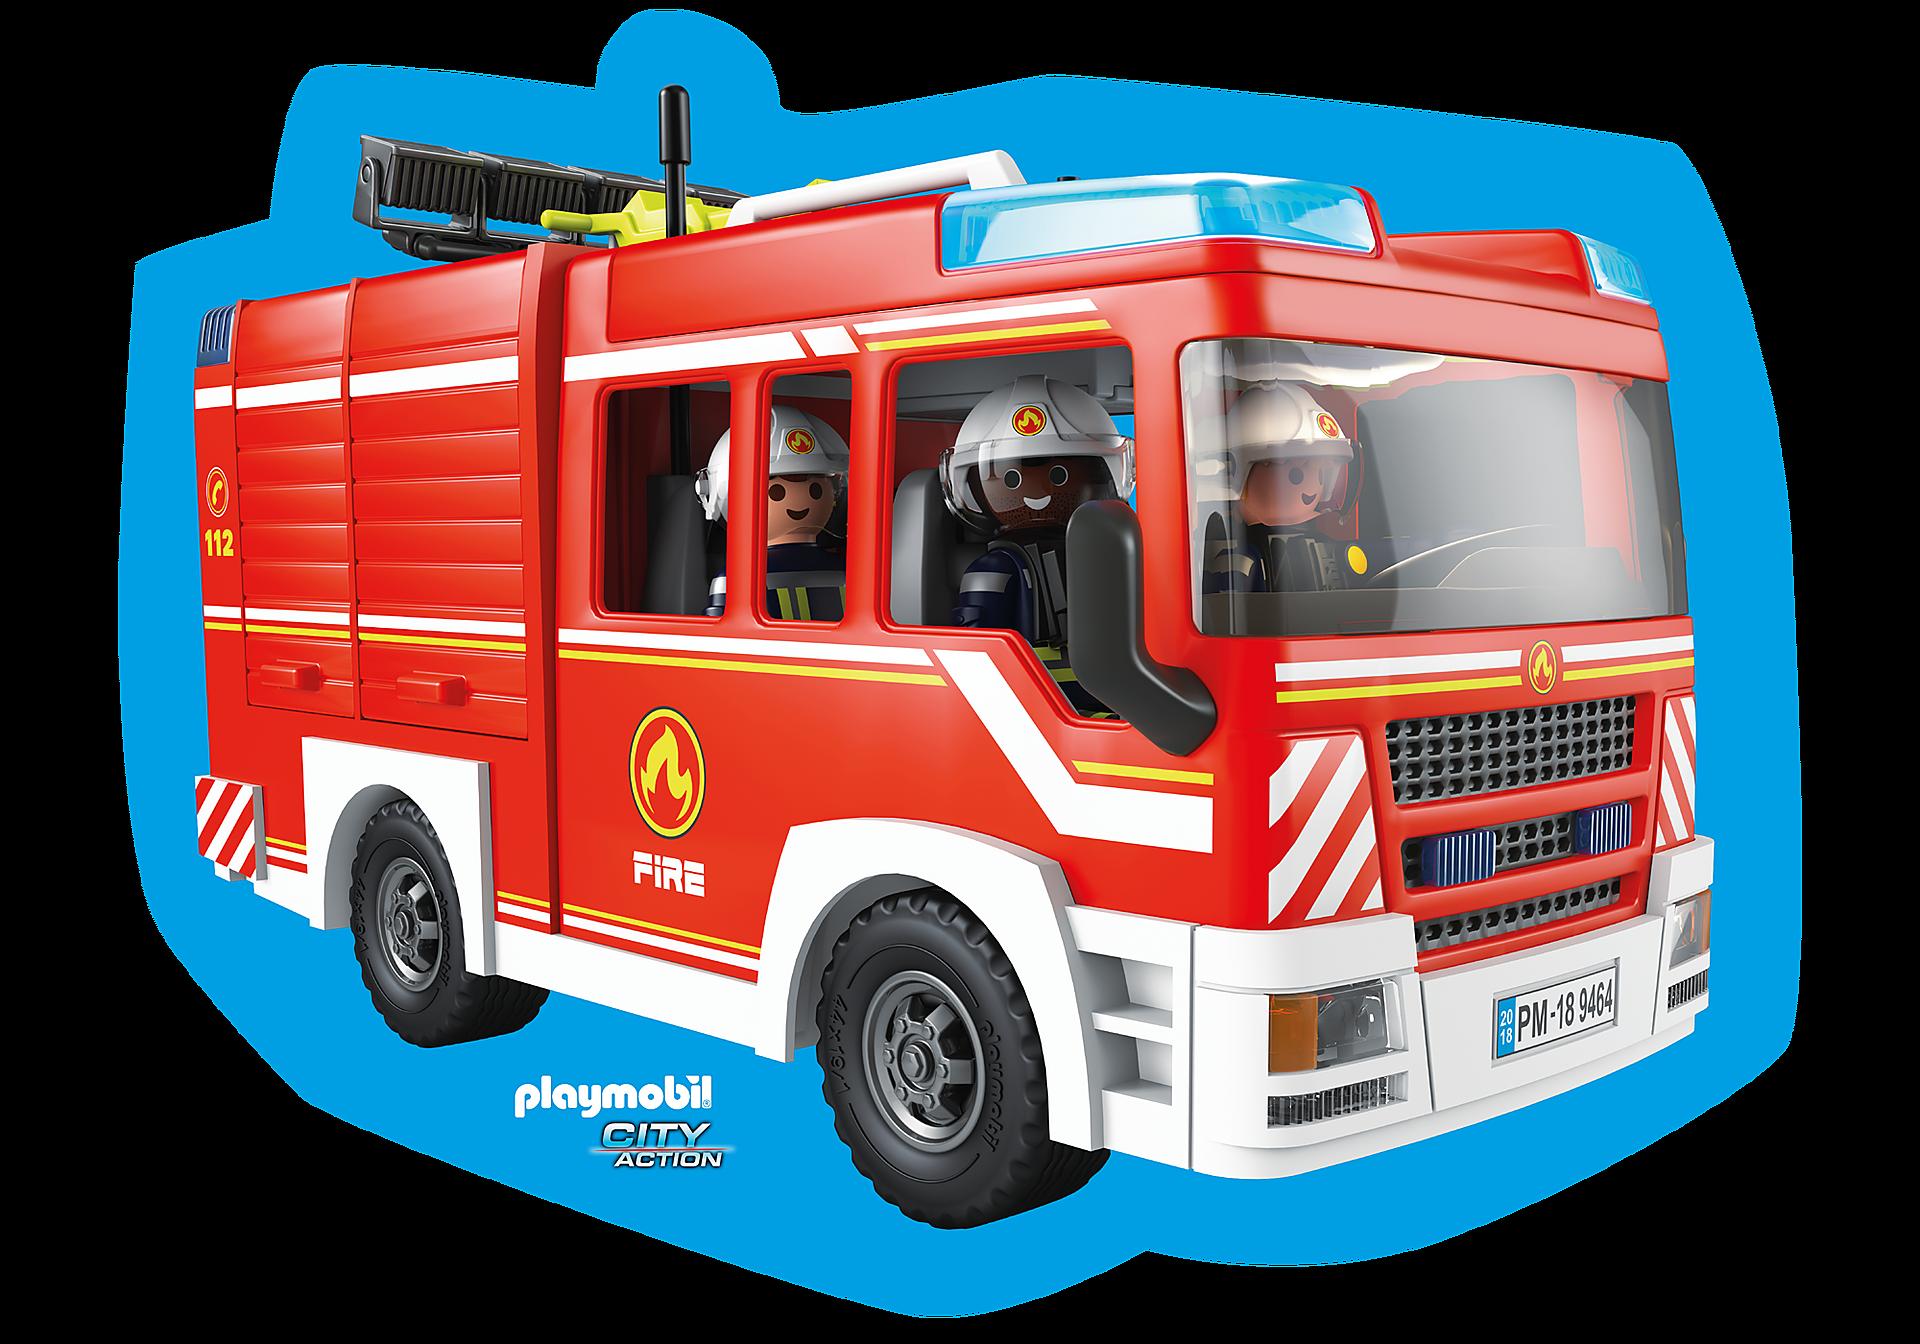 80215 Playmobil Kissen Feuerwehr zoom image1